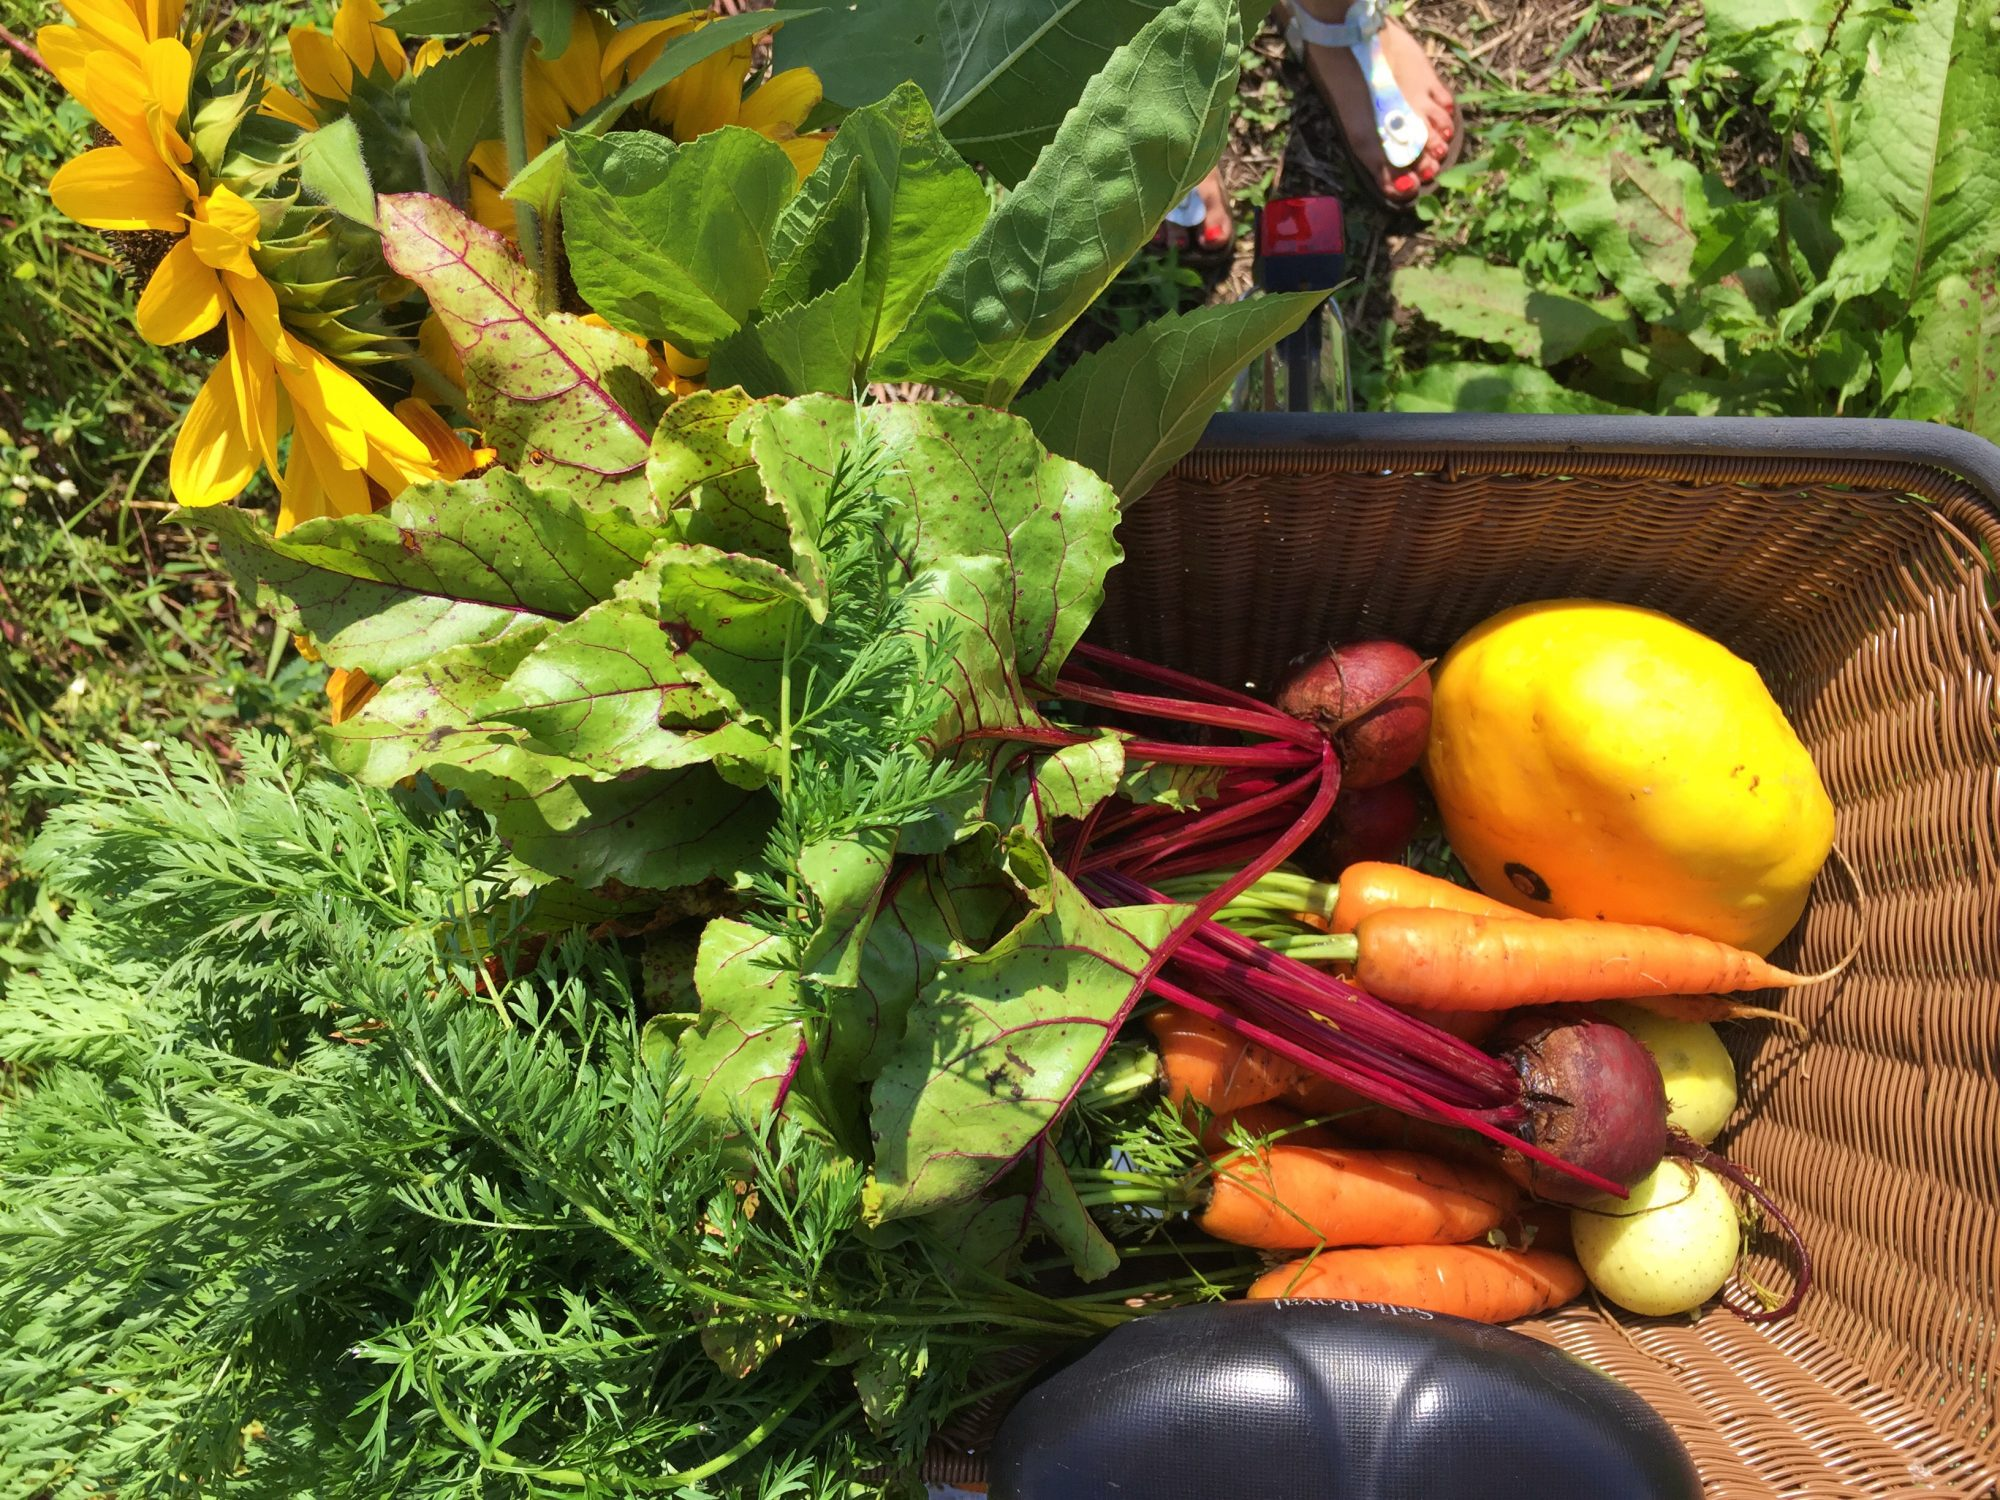 Gemüse im Fahrradkorb